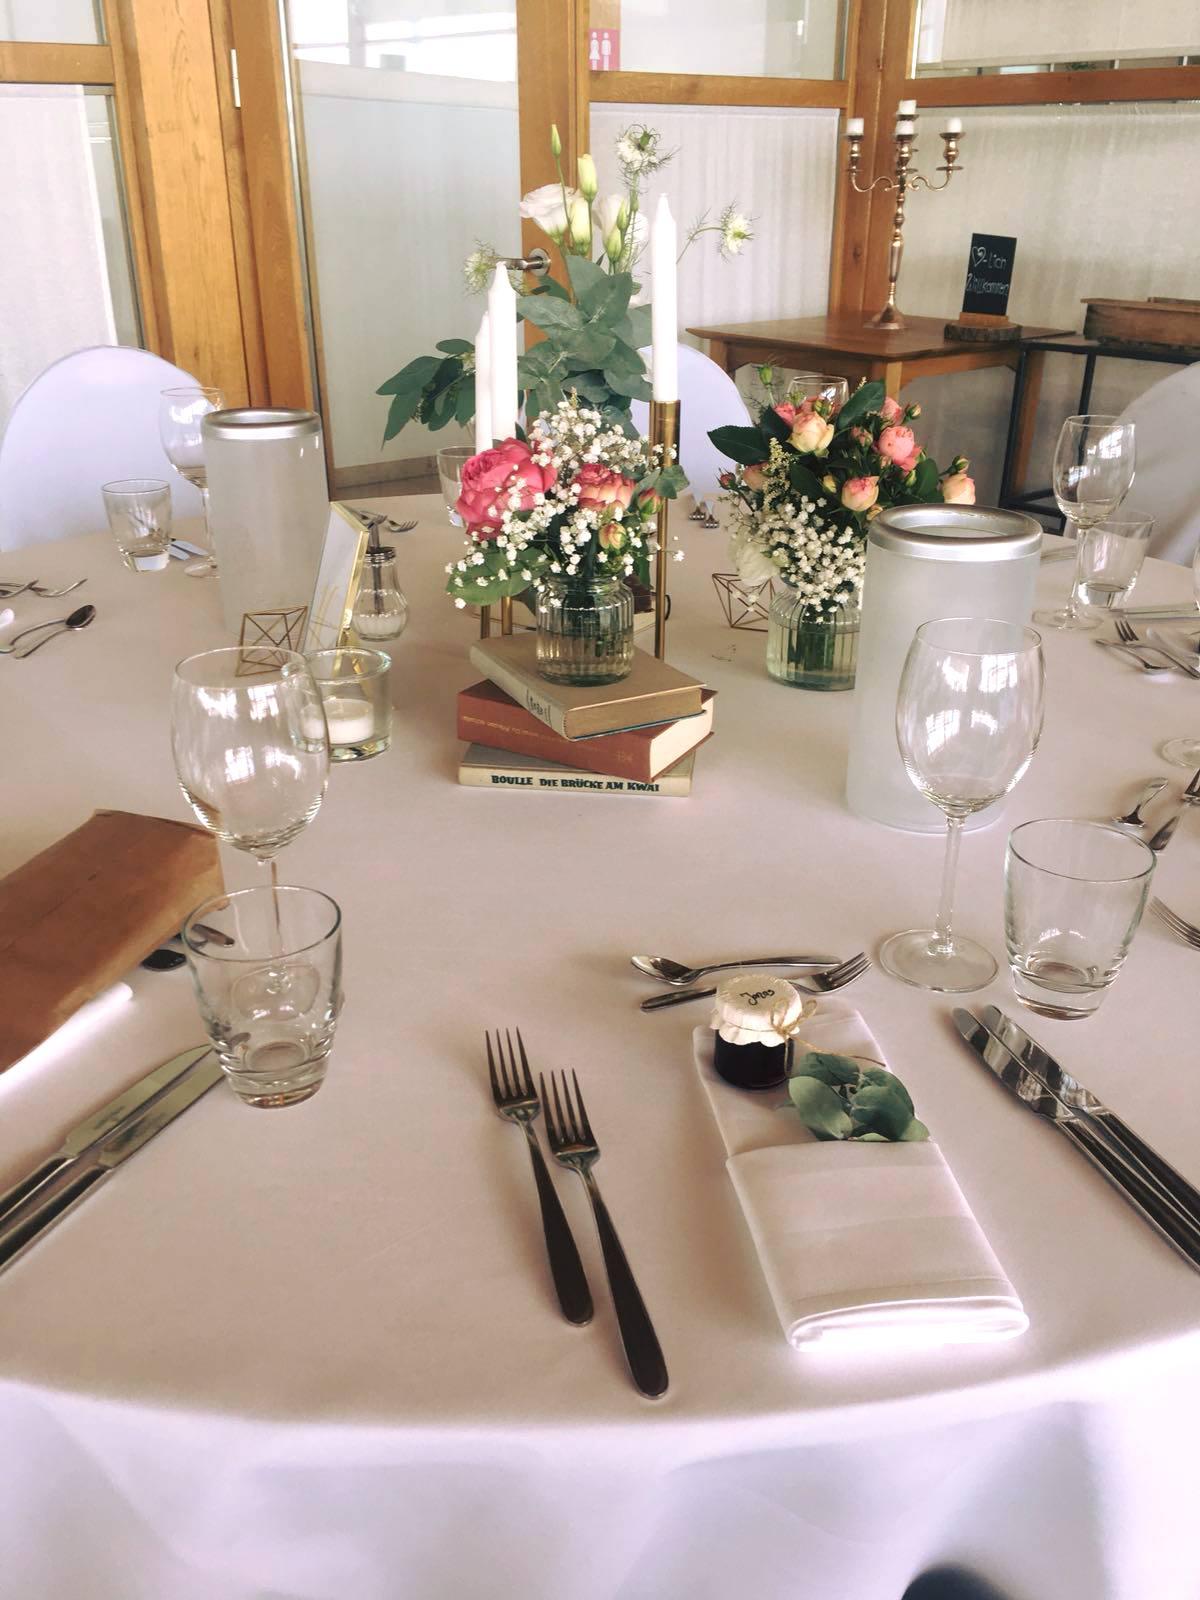 Hochzeitssaison 2018 Heckers - Restaurant, Café, Bar - Heckers